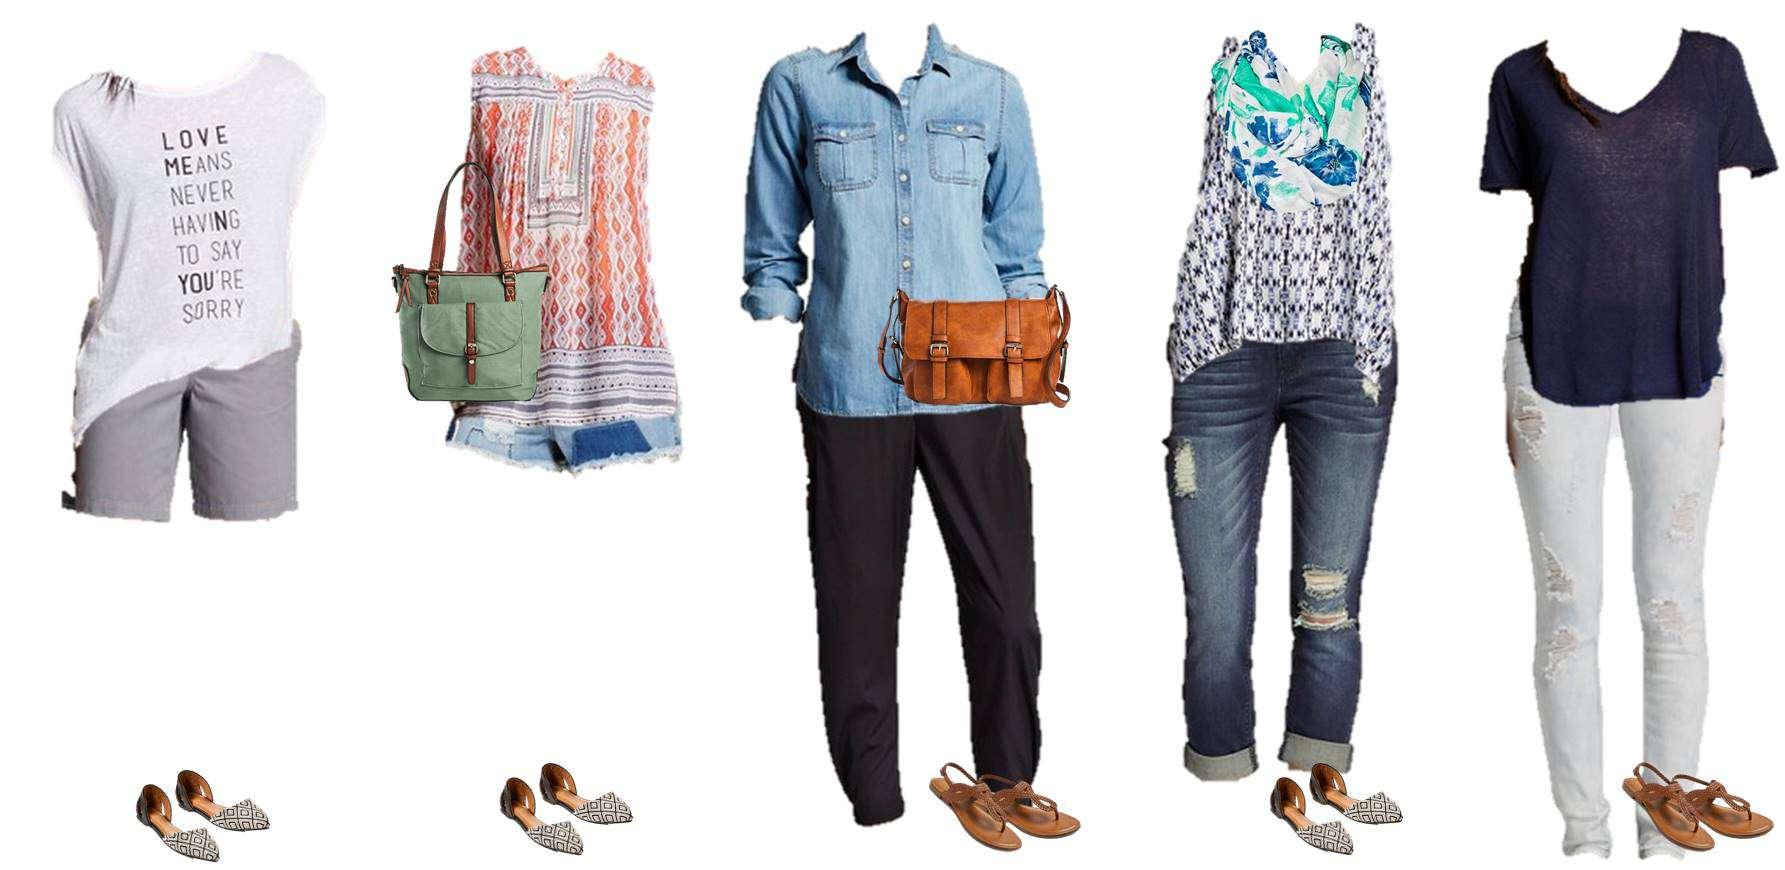 4.14 Mix & Match Fashion - Target Summer Styles 6-10